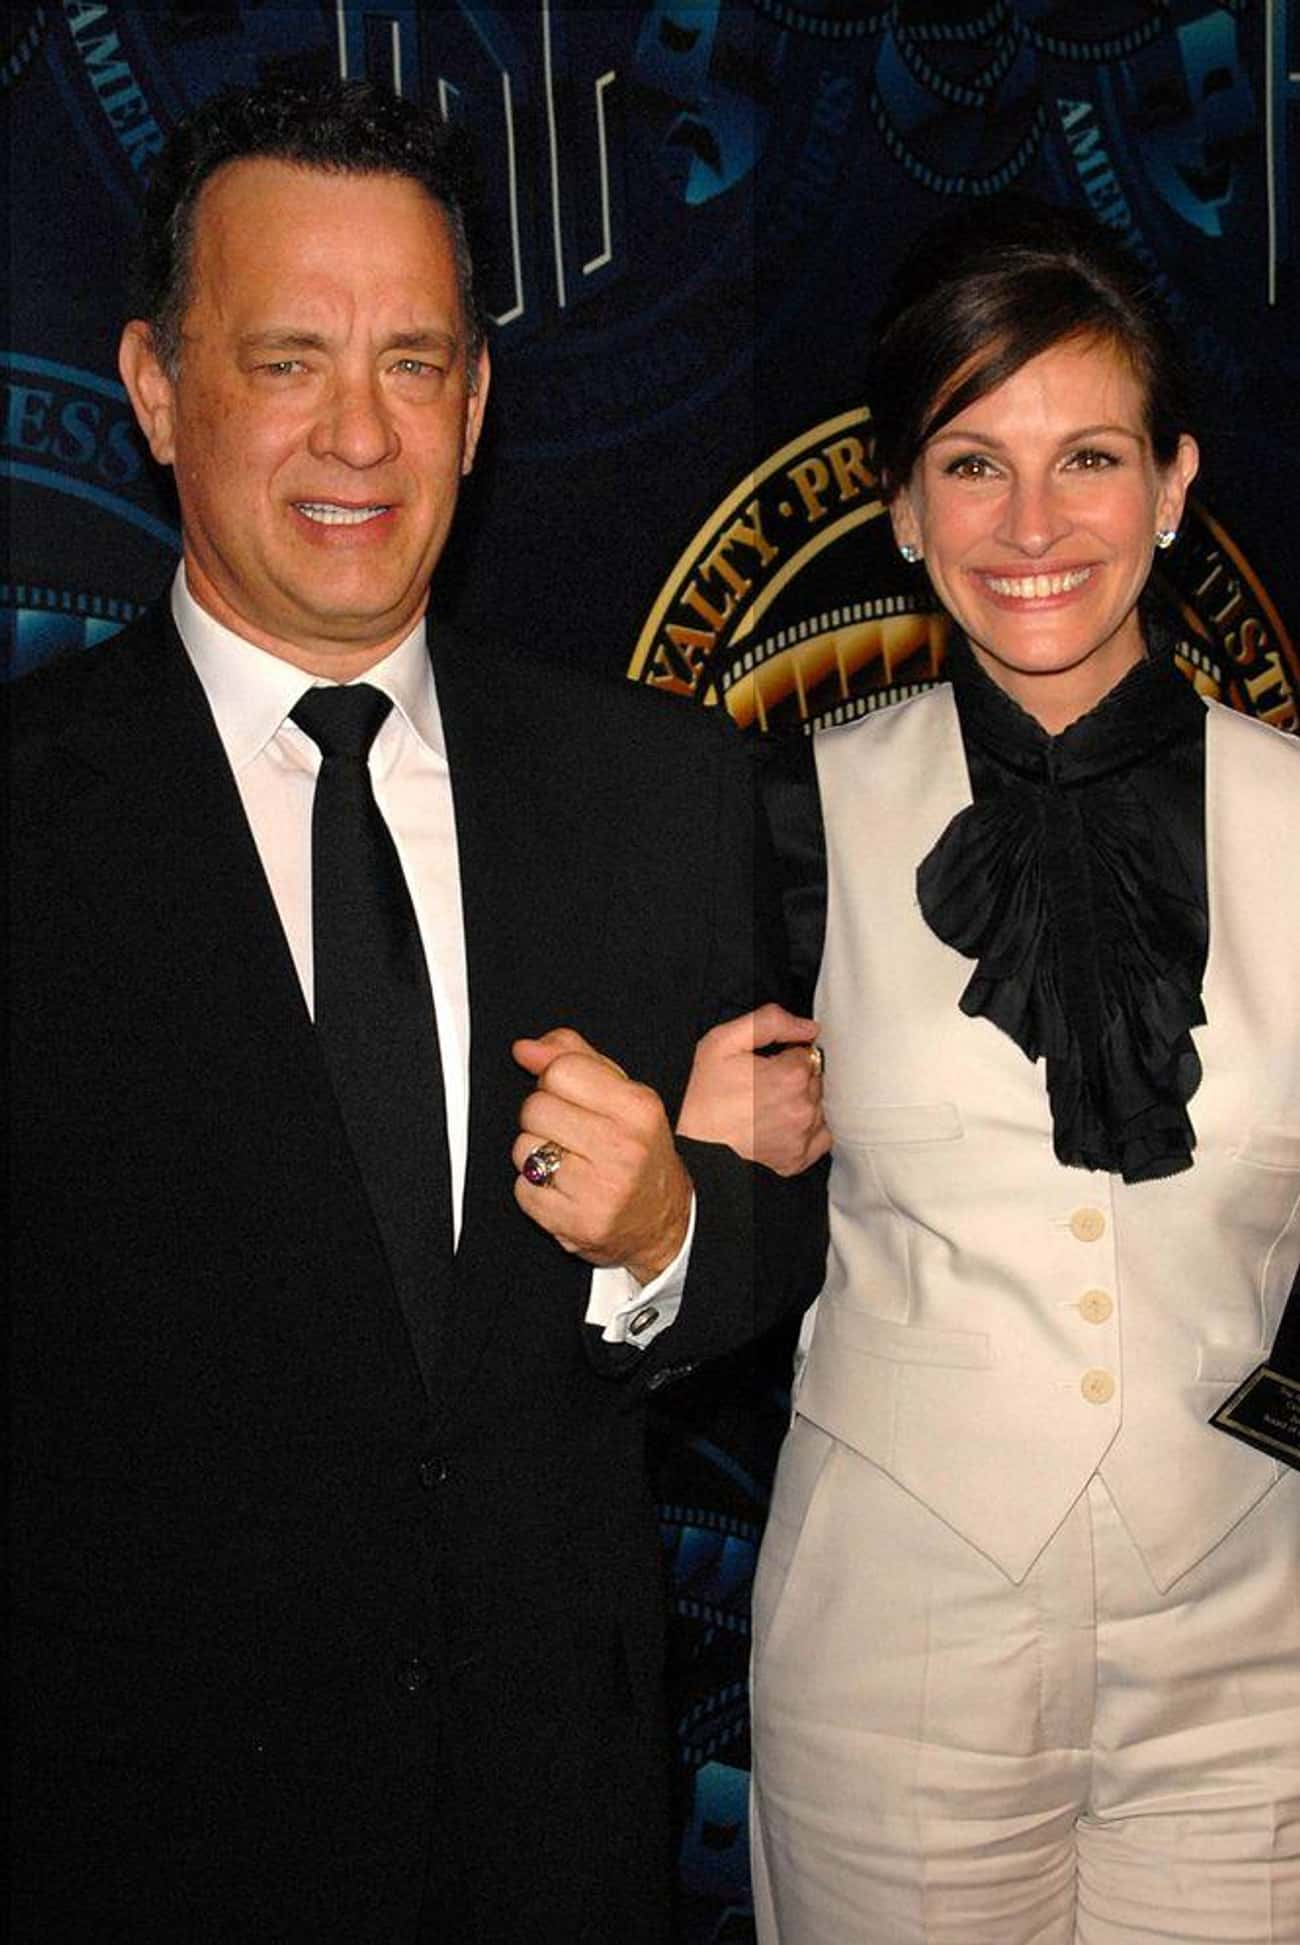 Tom Hanks Played on Julia Roberts's Love of Knitting